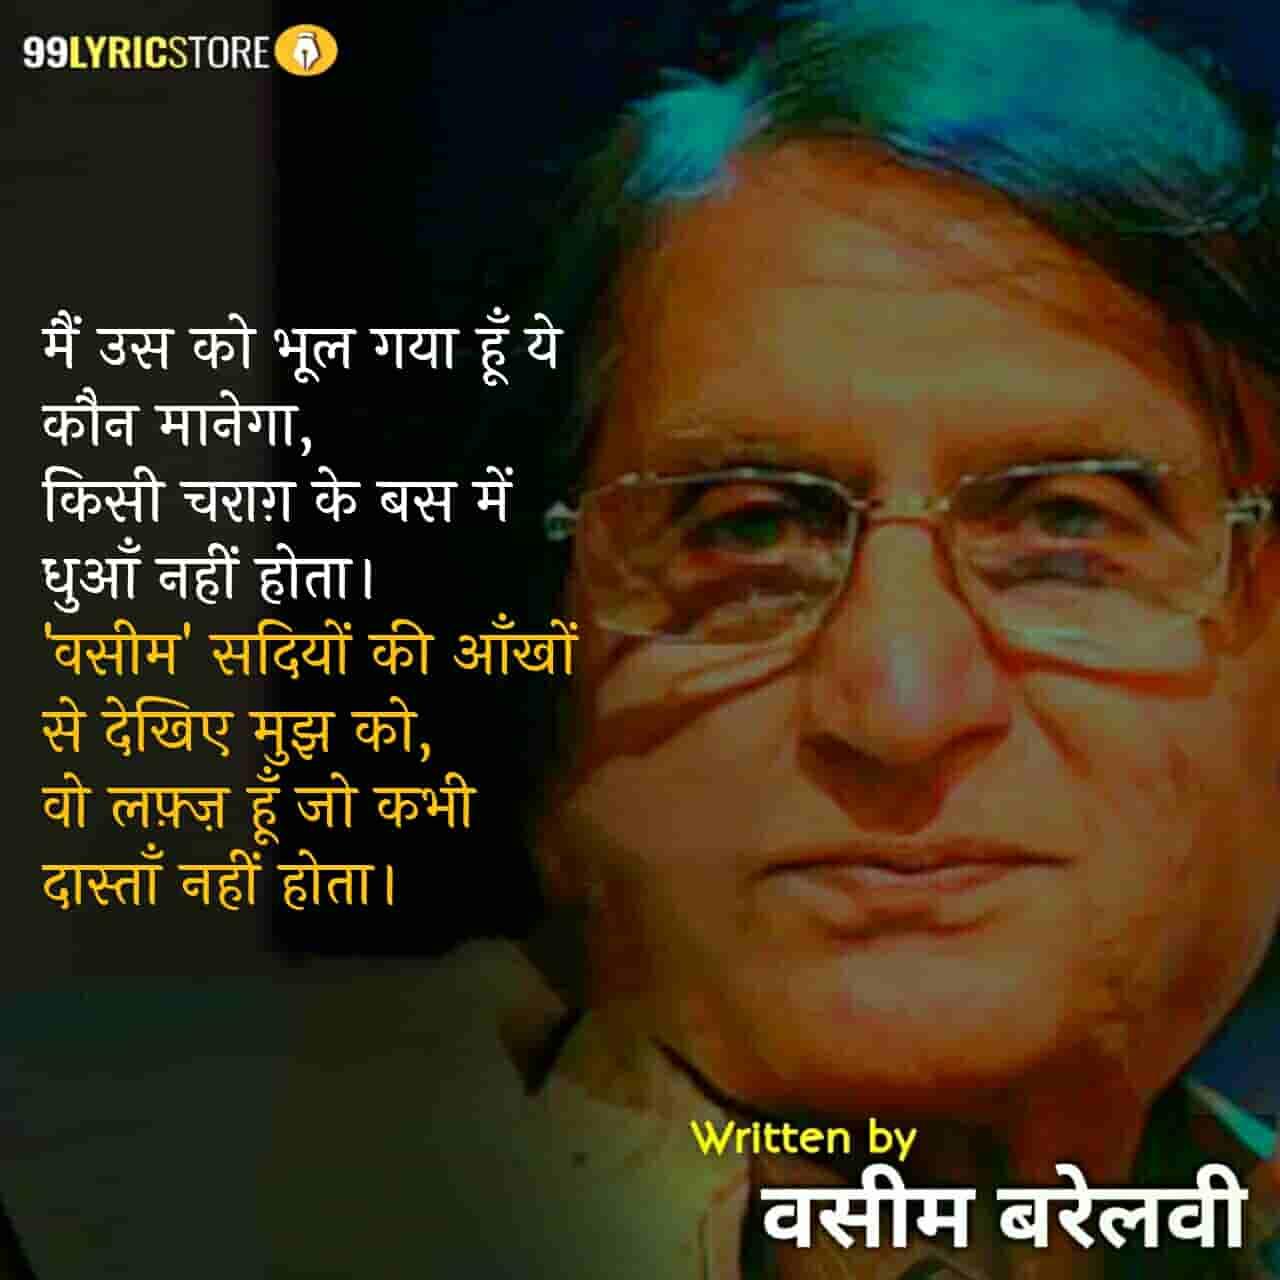 This beautiful Ghazal 'Lahoo Na Ho Toh Kalam Tarjuma Nahin Hota' has written by Waseem Barelvi.